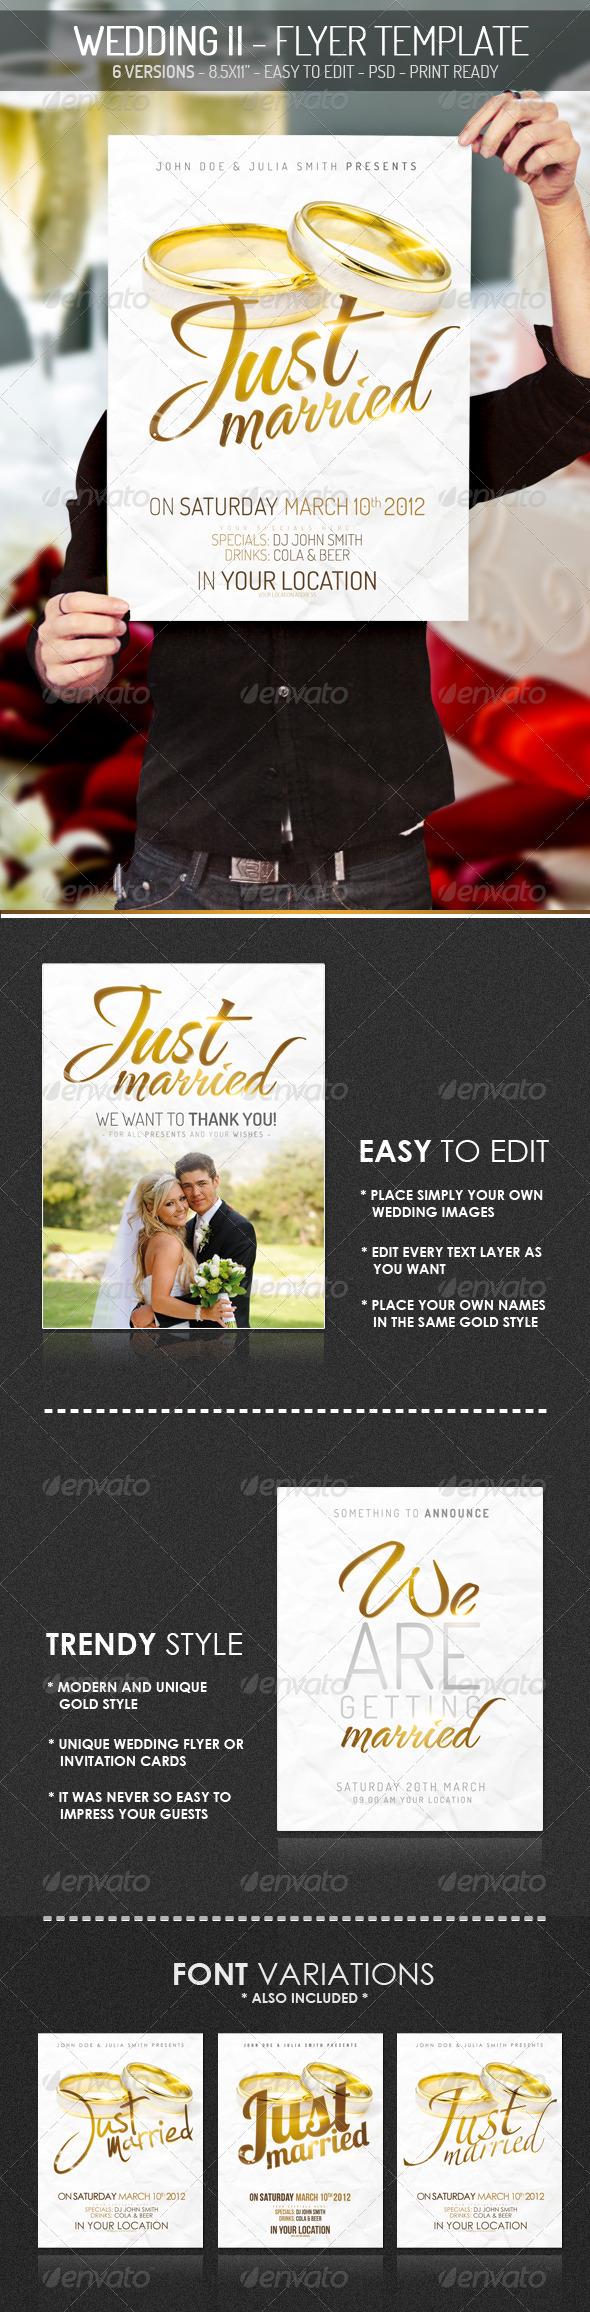 GraphicRiver Wedding II Flyer Template 1667481